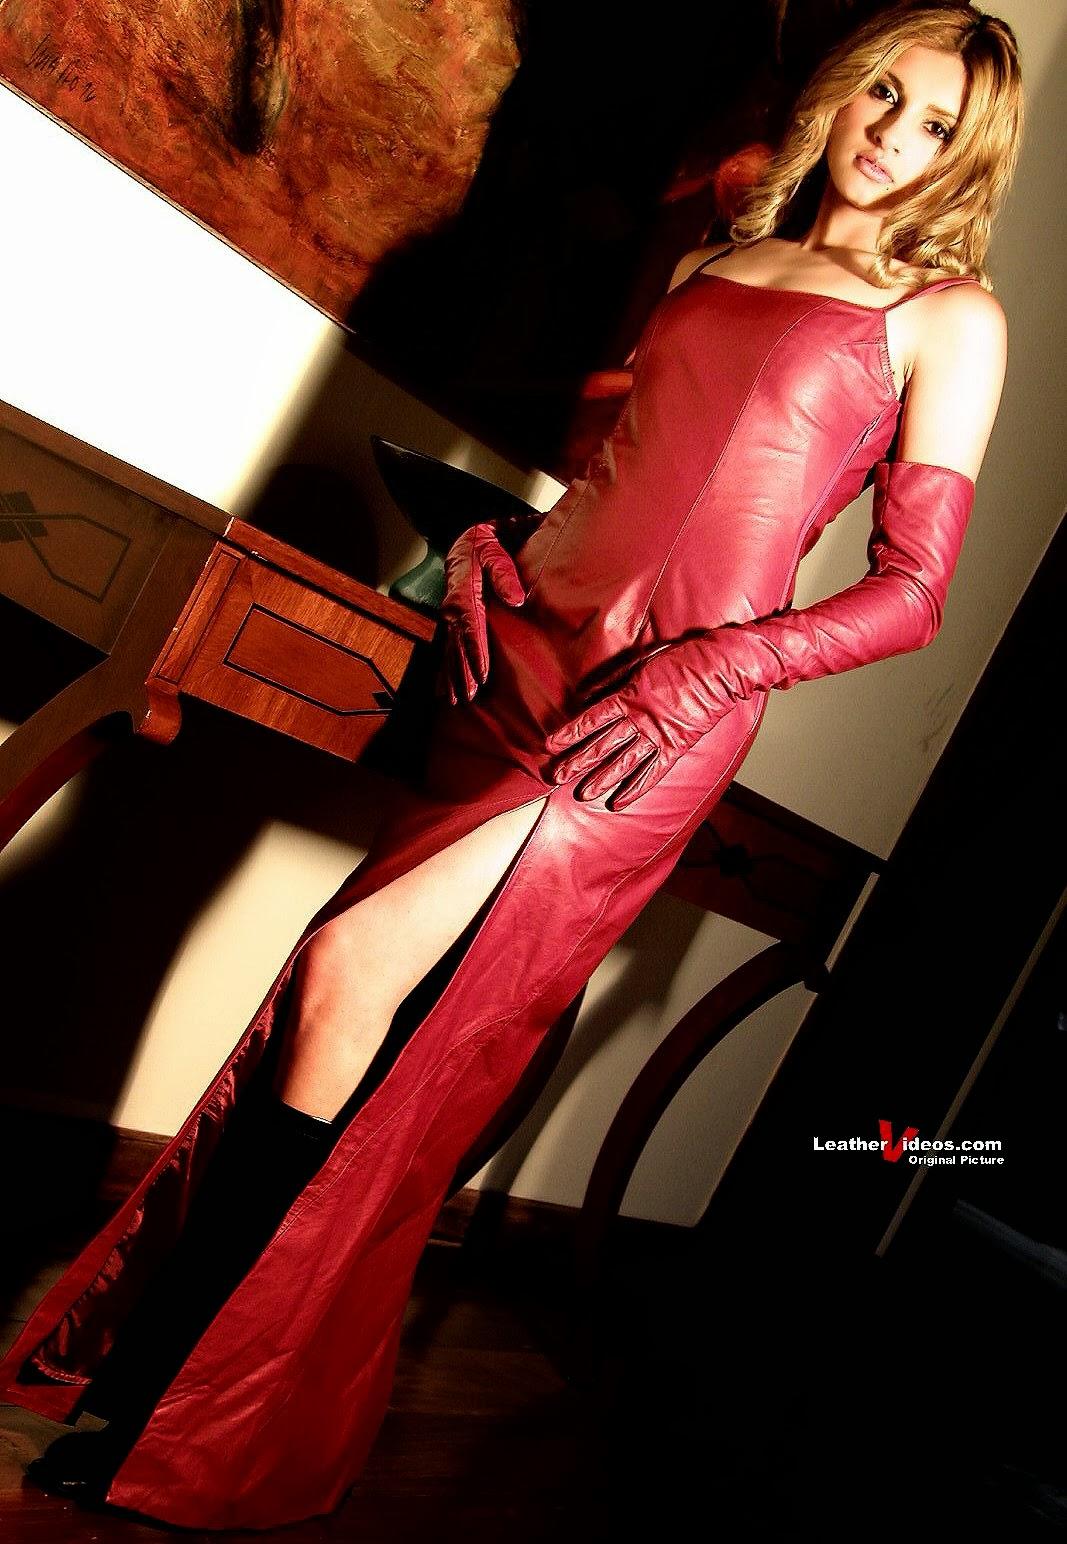 Leather Leather Leather Blog: Leathervideos Pink Leather Dress